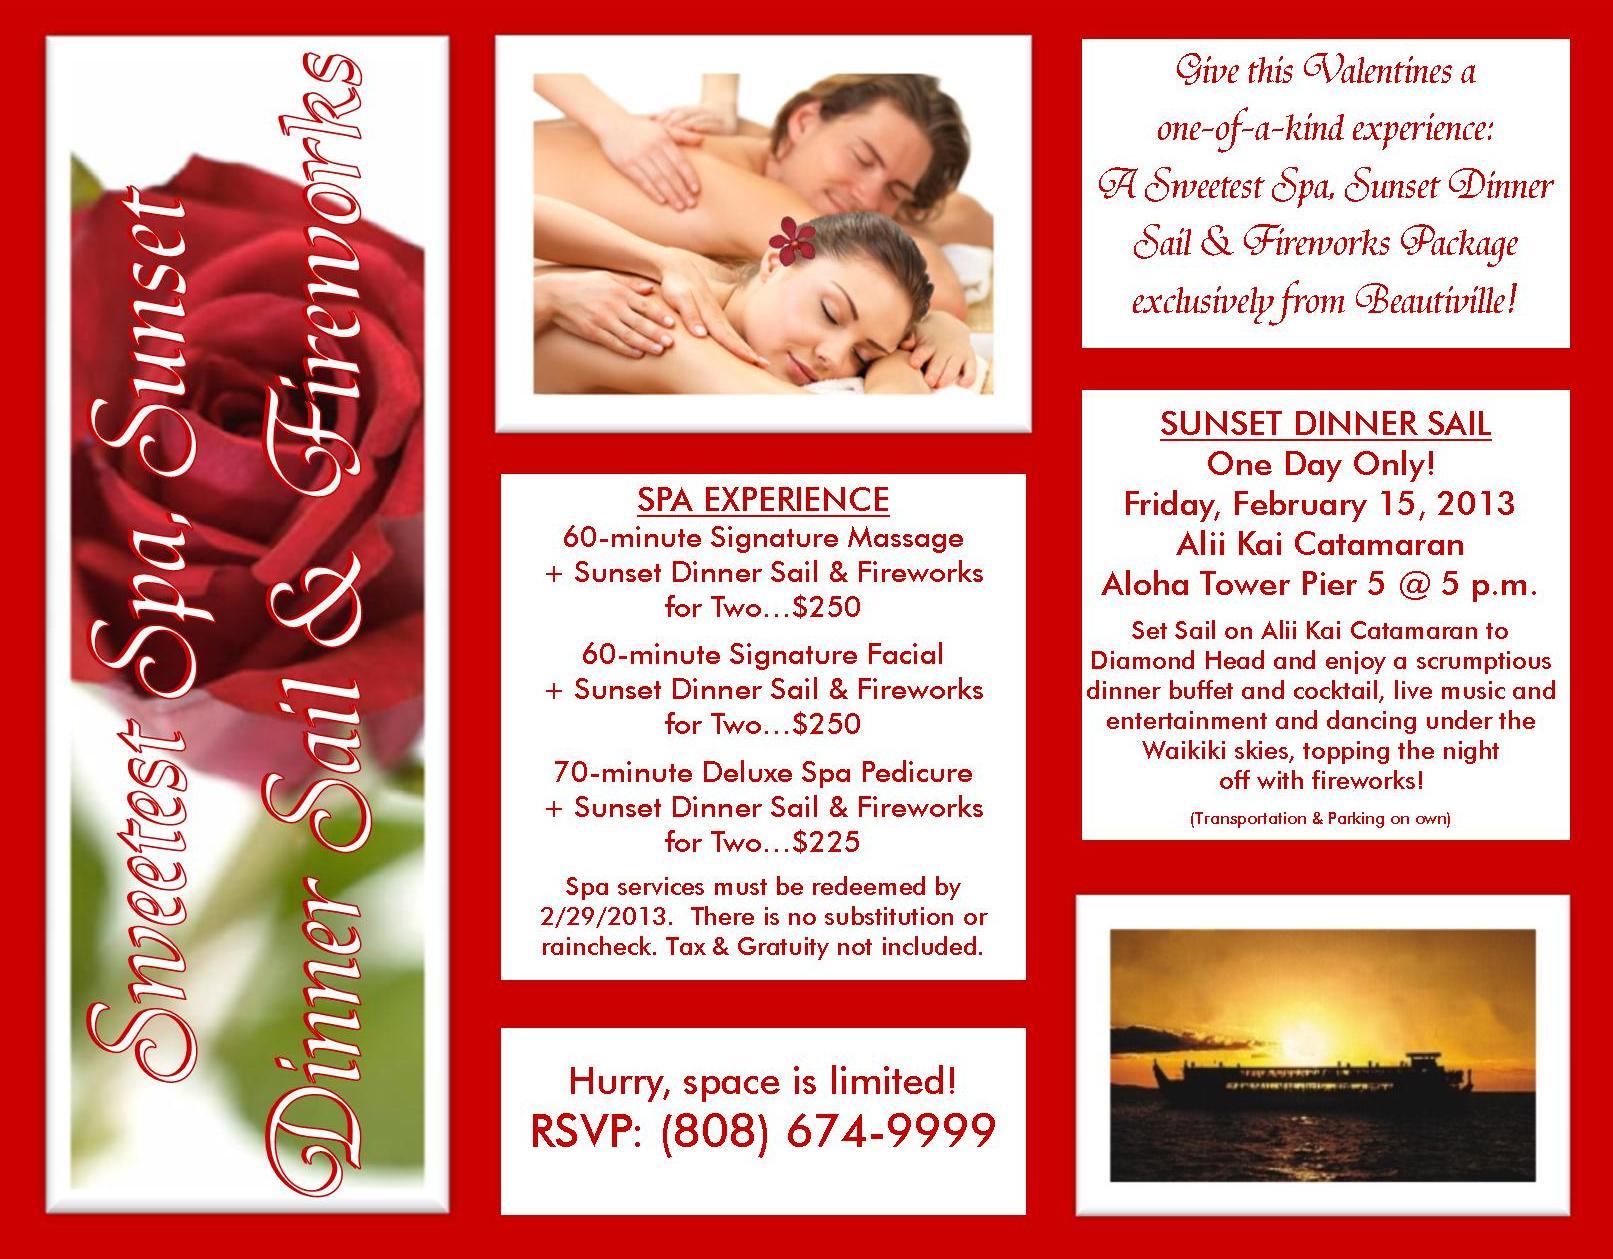 Valentines Sweetest Spa, Sunset Dinner Sail & Fireworks